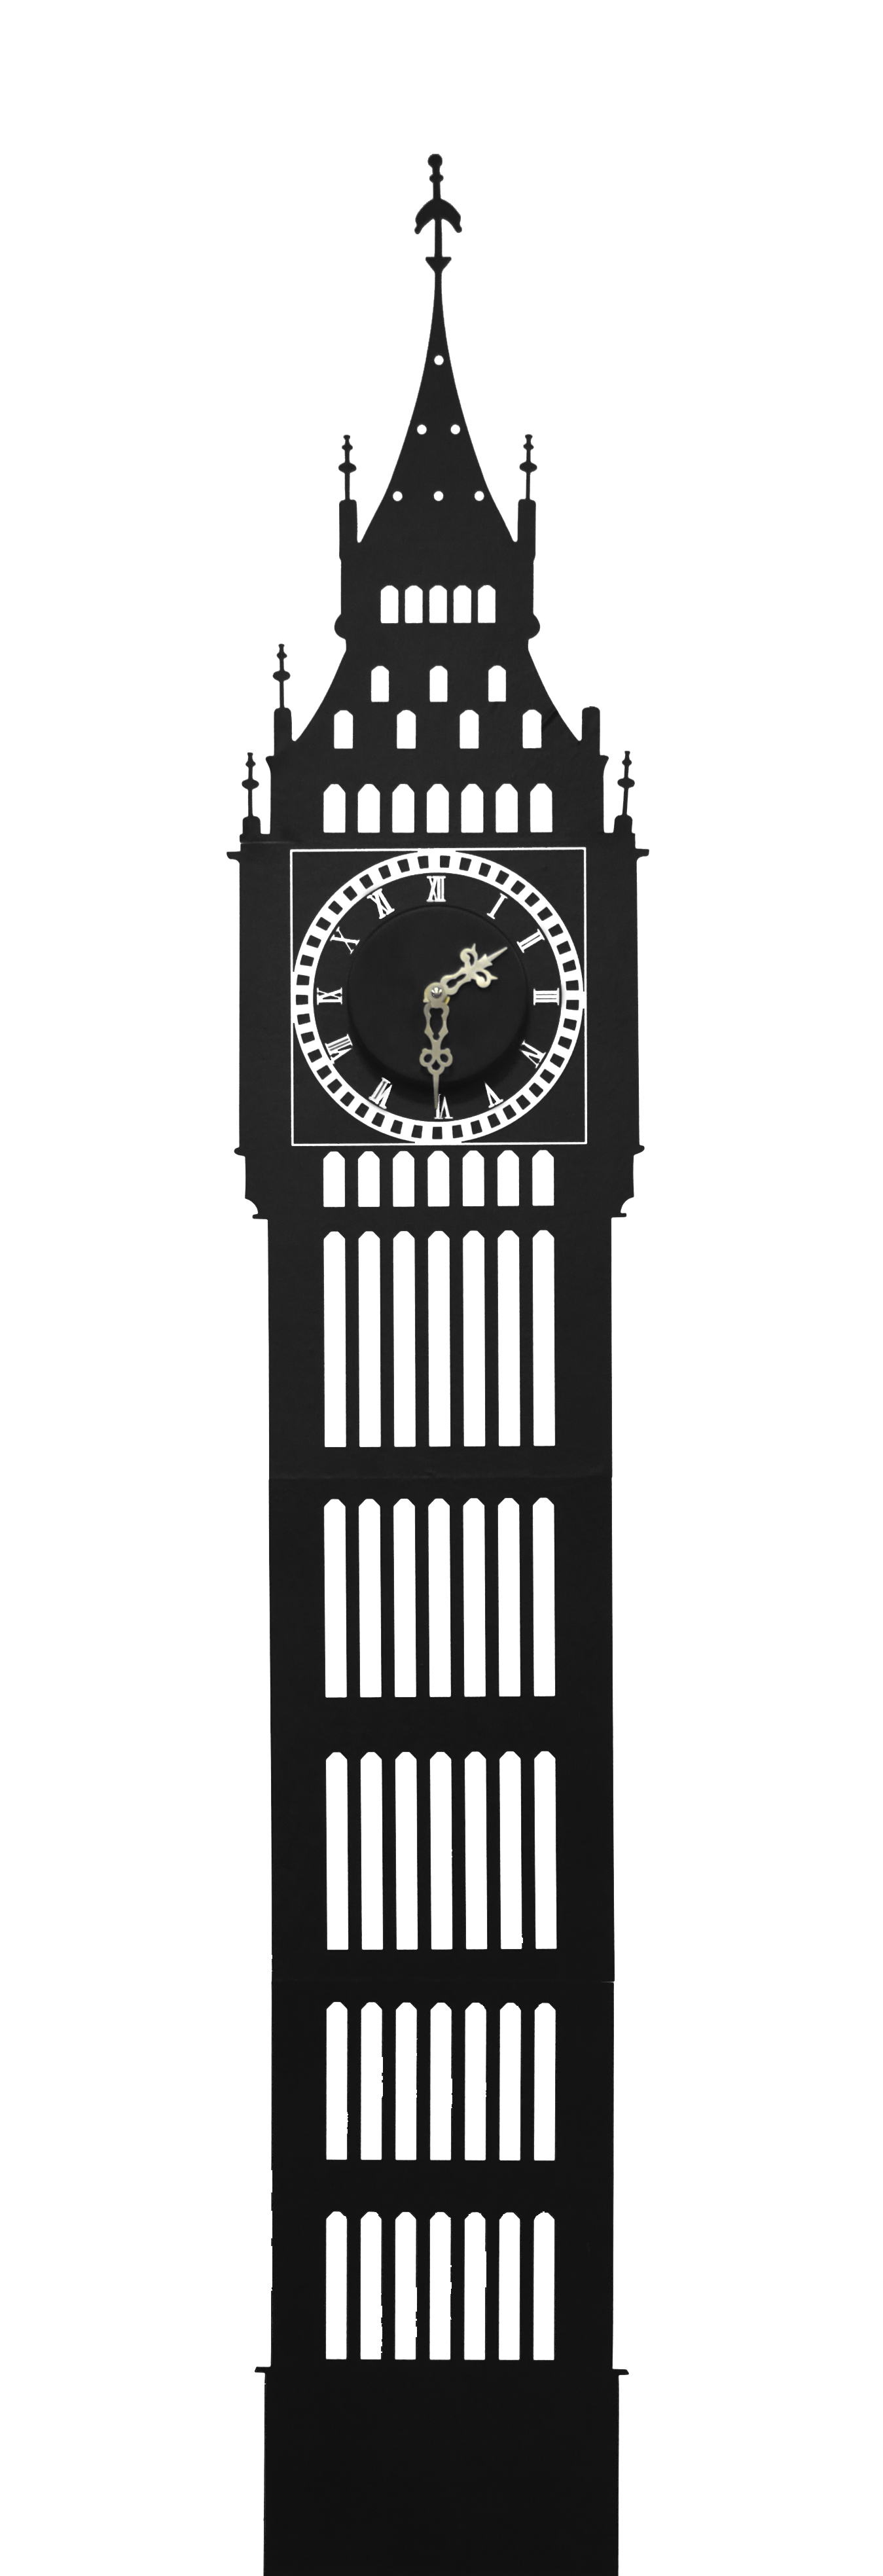 1349x3936 Europe Clipart Big Ben London